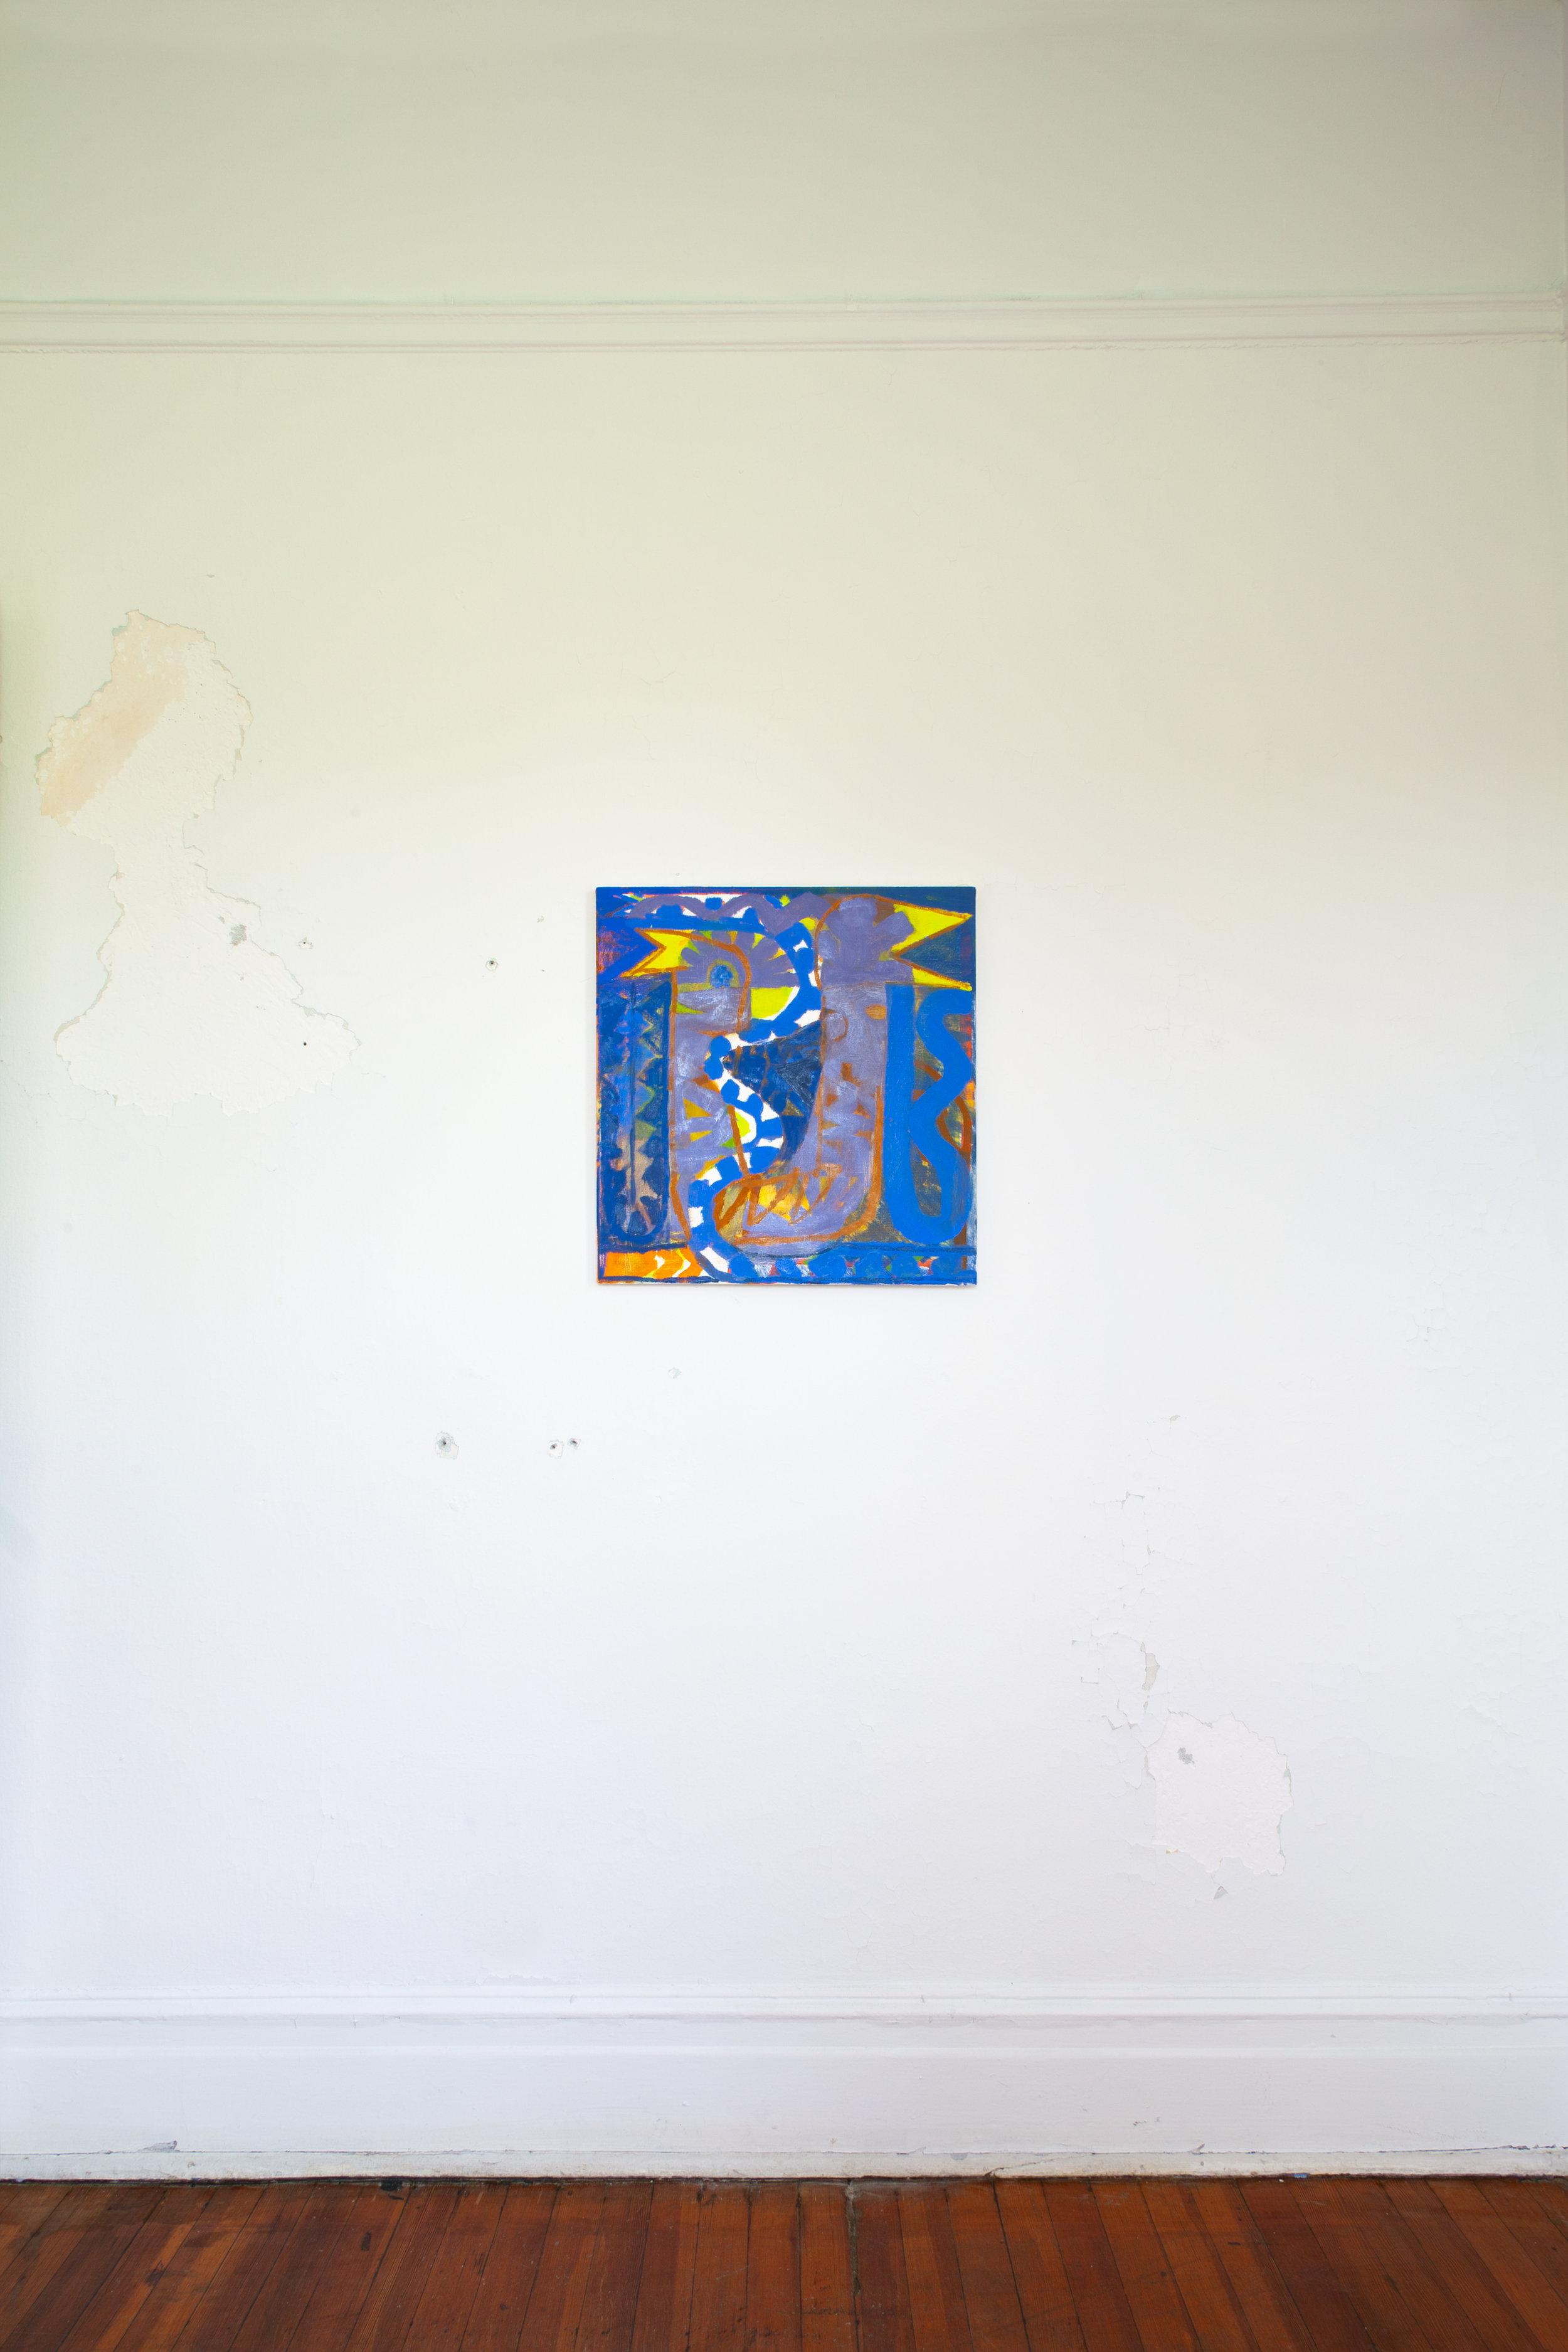 Meghan_Brady-NADA_House-2019-installation_view_08.jpg